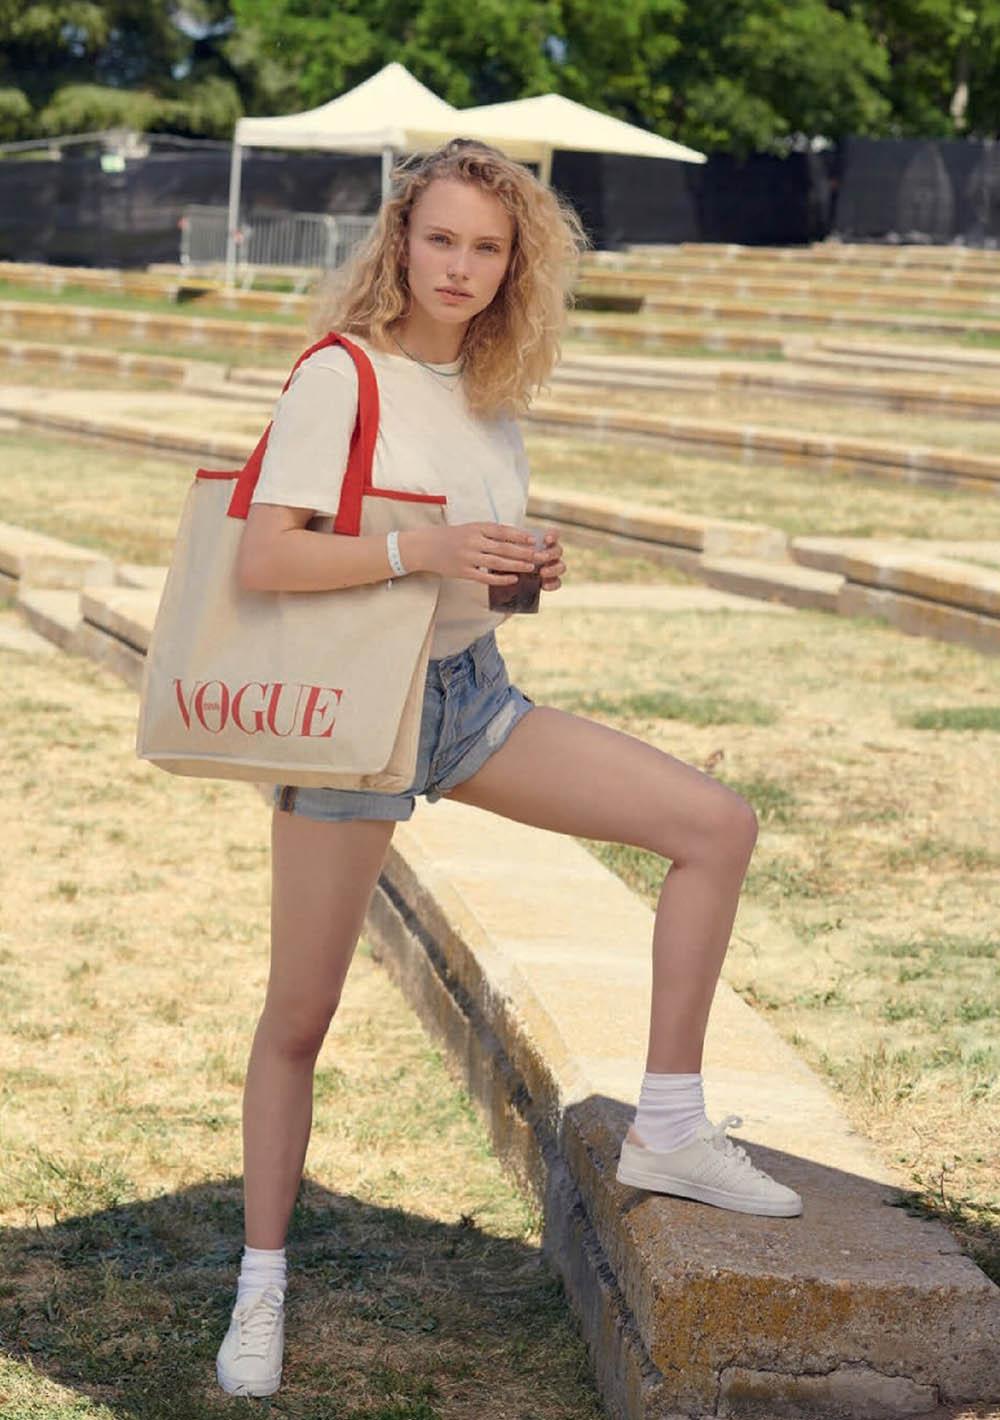 Kim van der Laan by Mel Karch for Vogue Spain July 2019